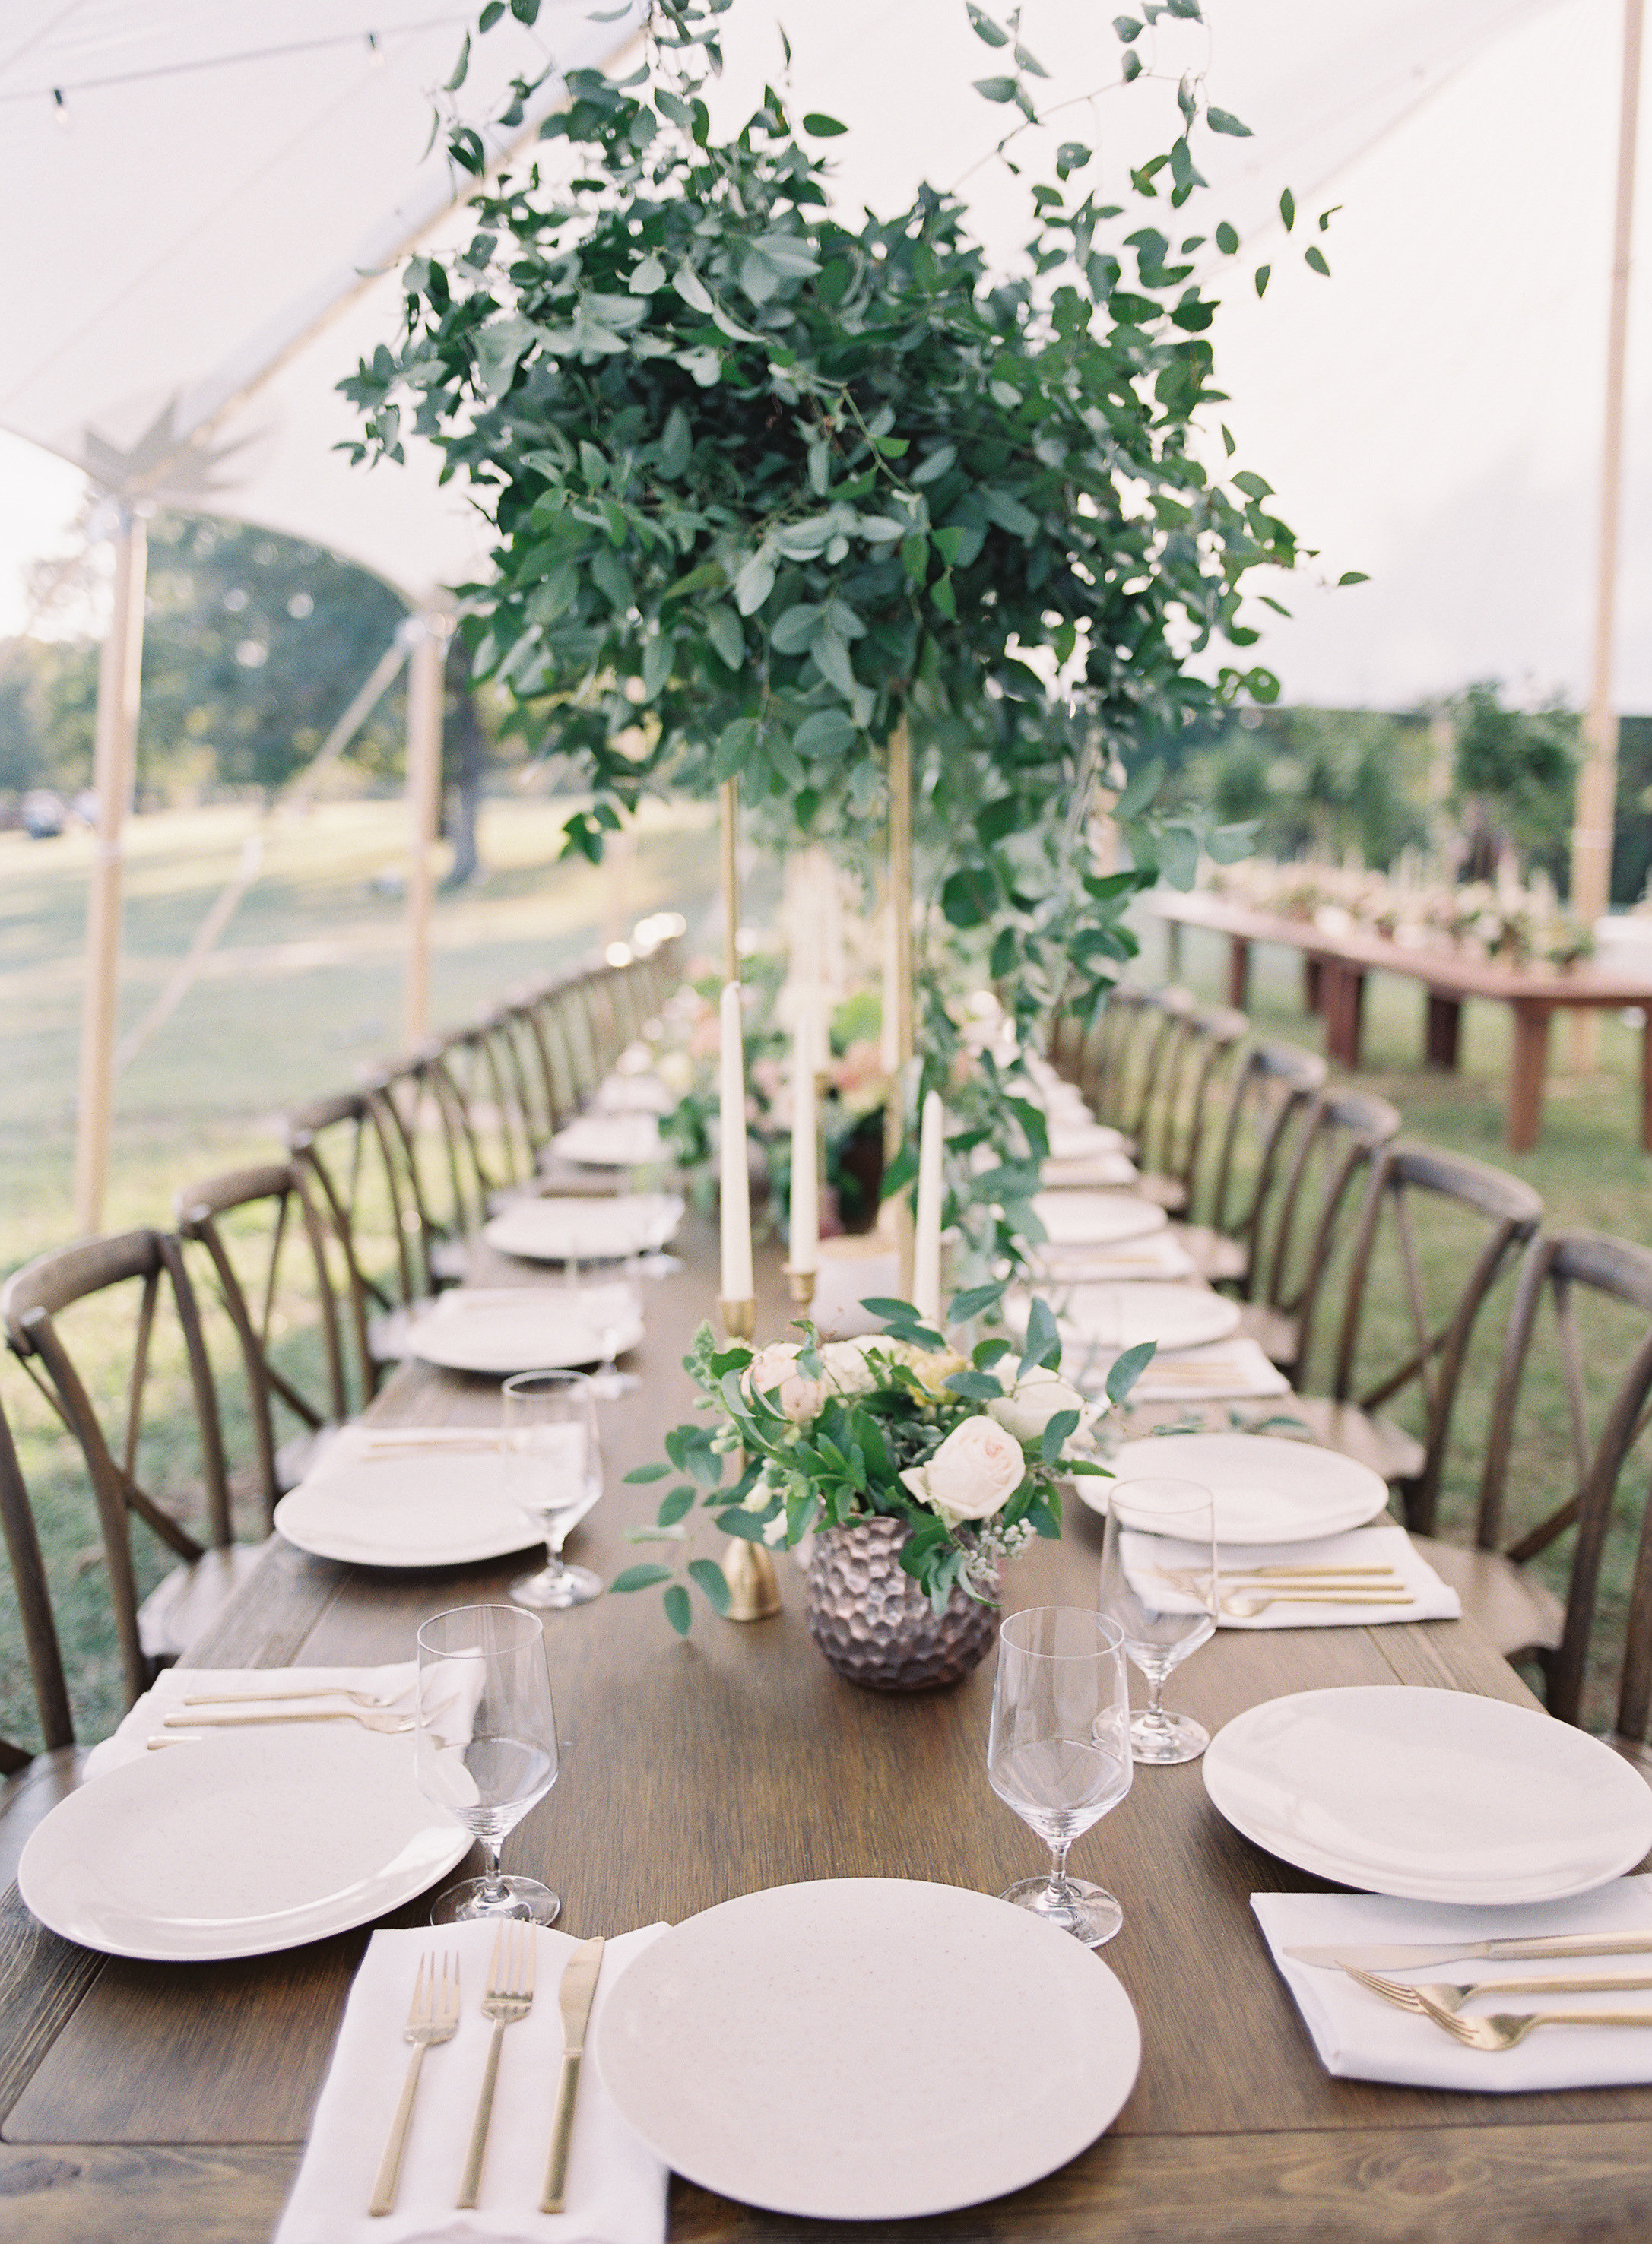 jessica-zimmerman-events-heather-payne-dan-and-shay-wedding-reception-tables.jpg